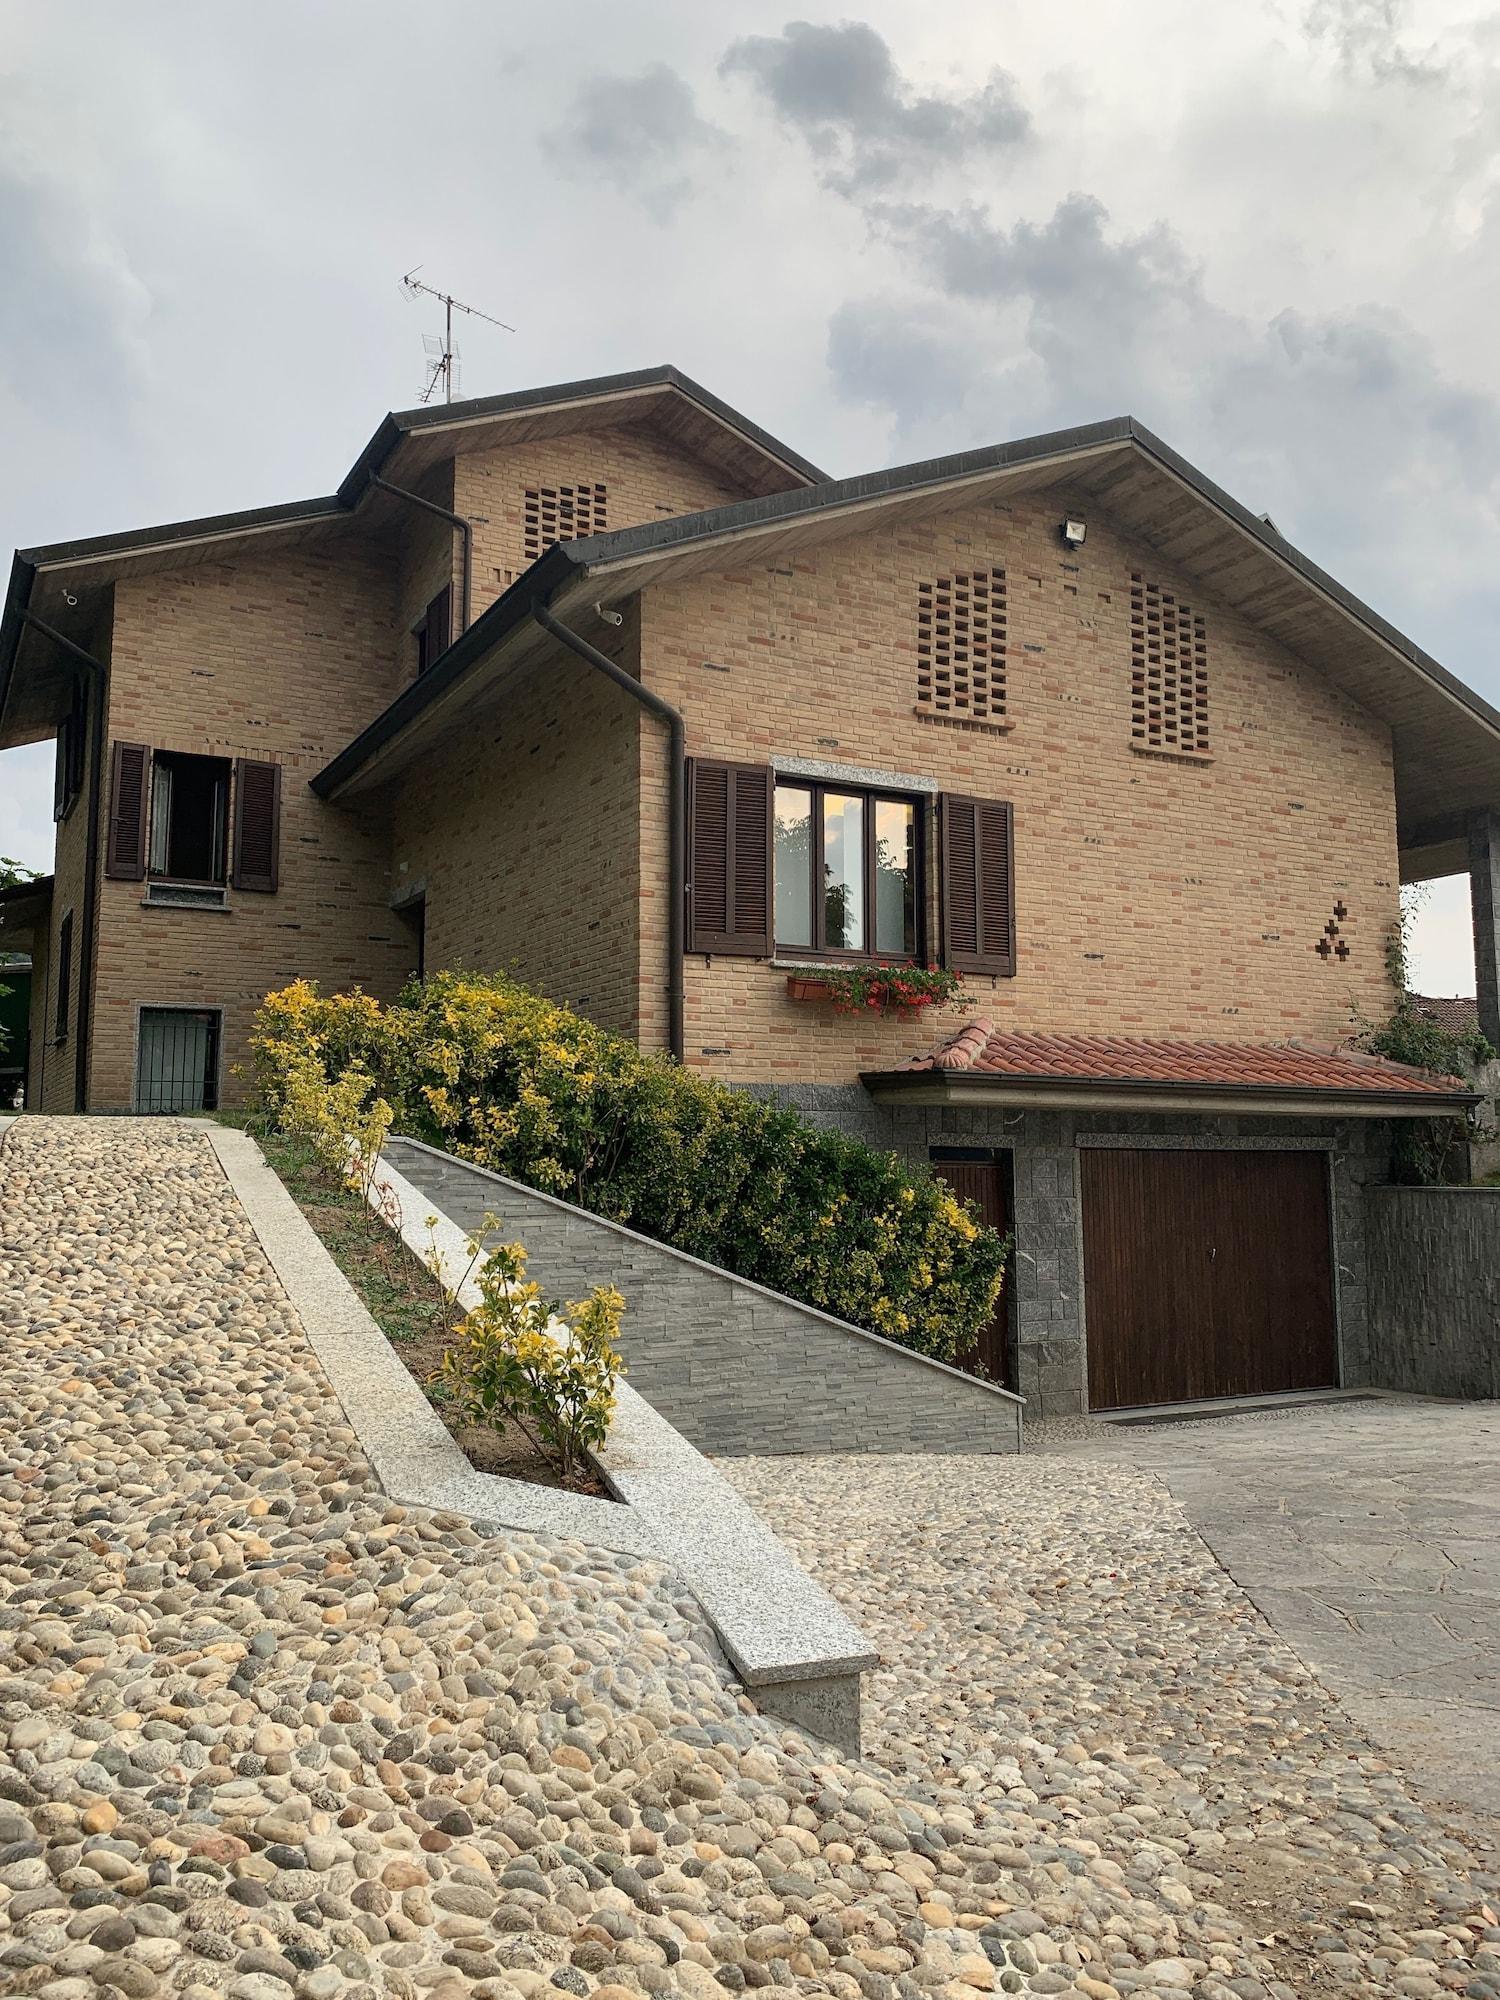 Villa Cuore, Como